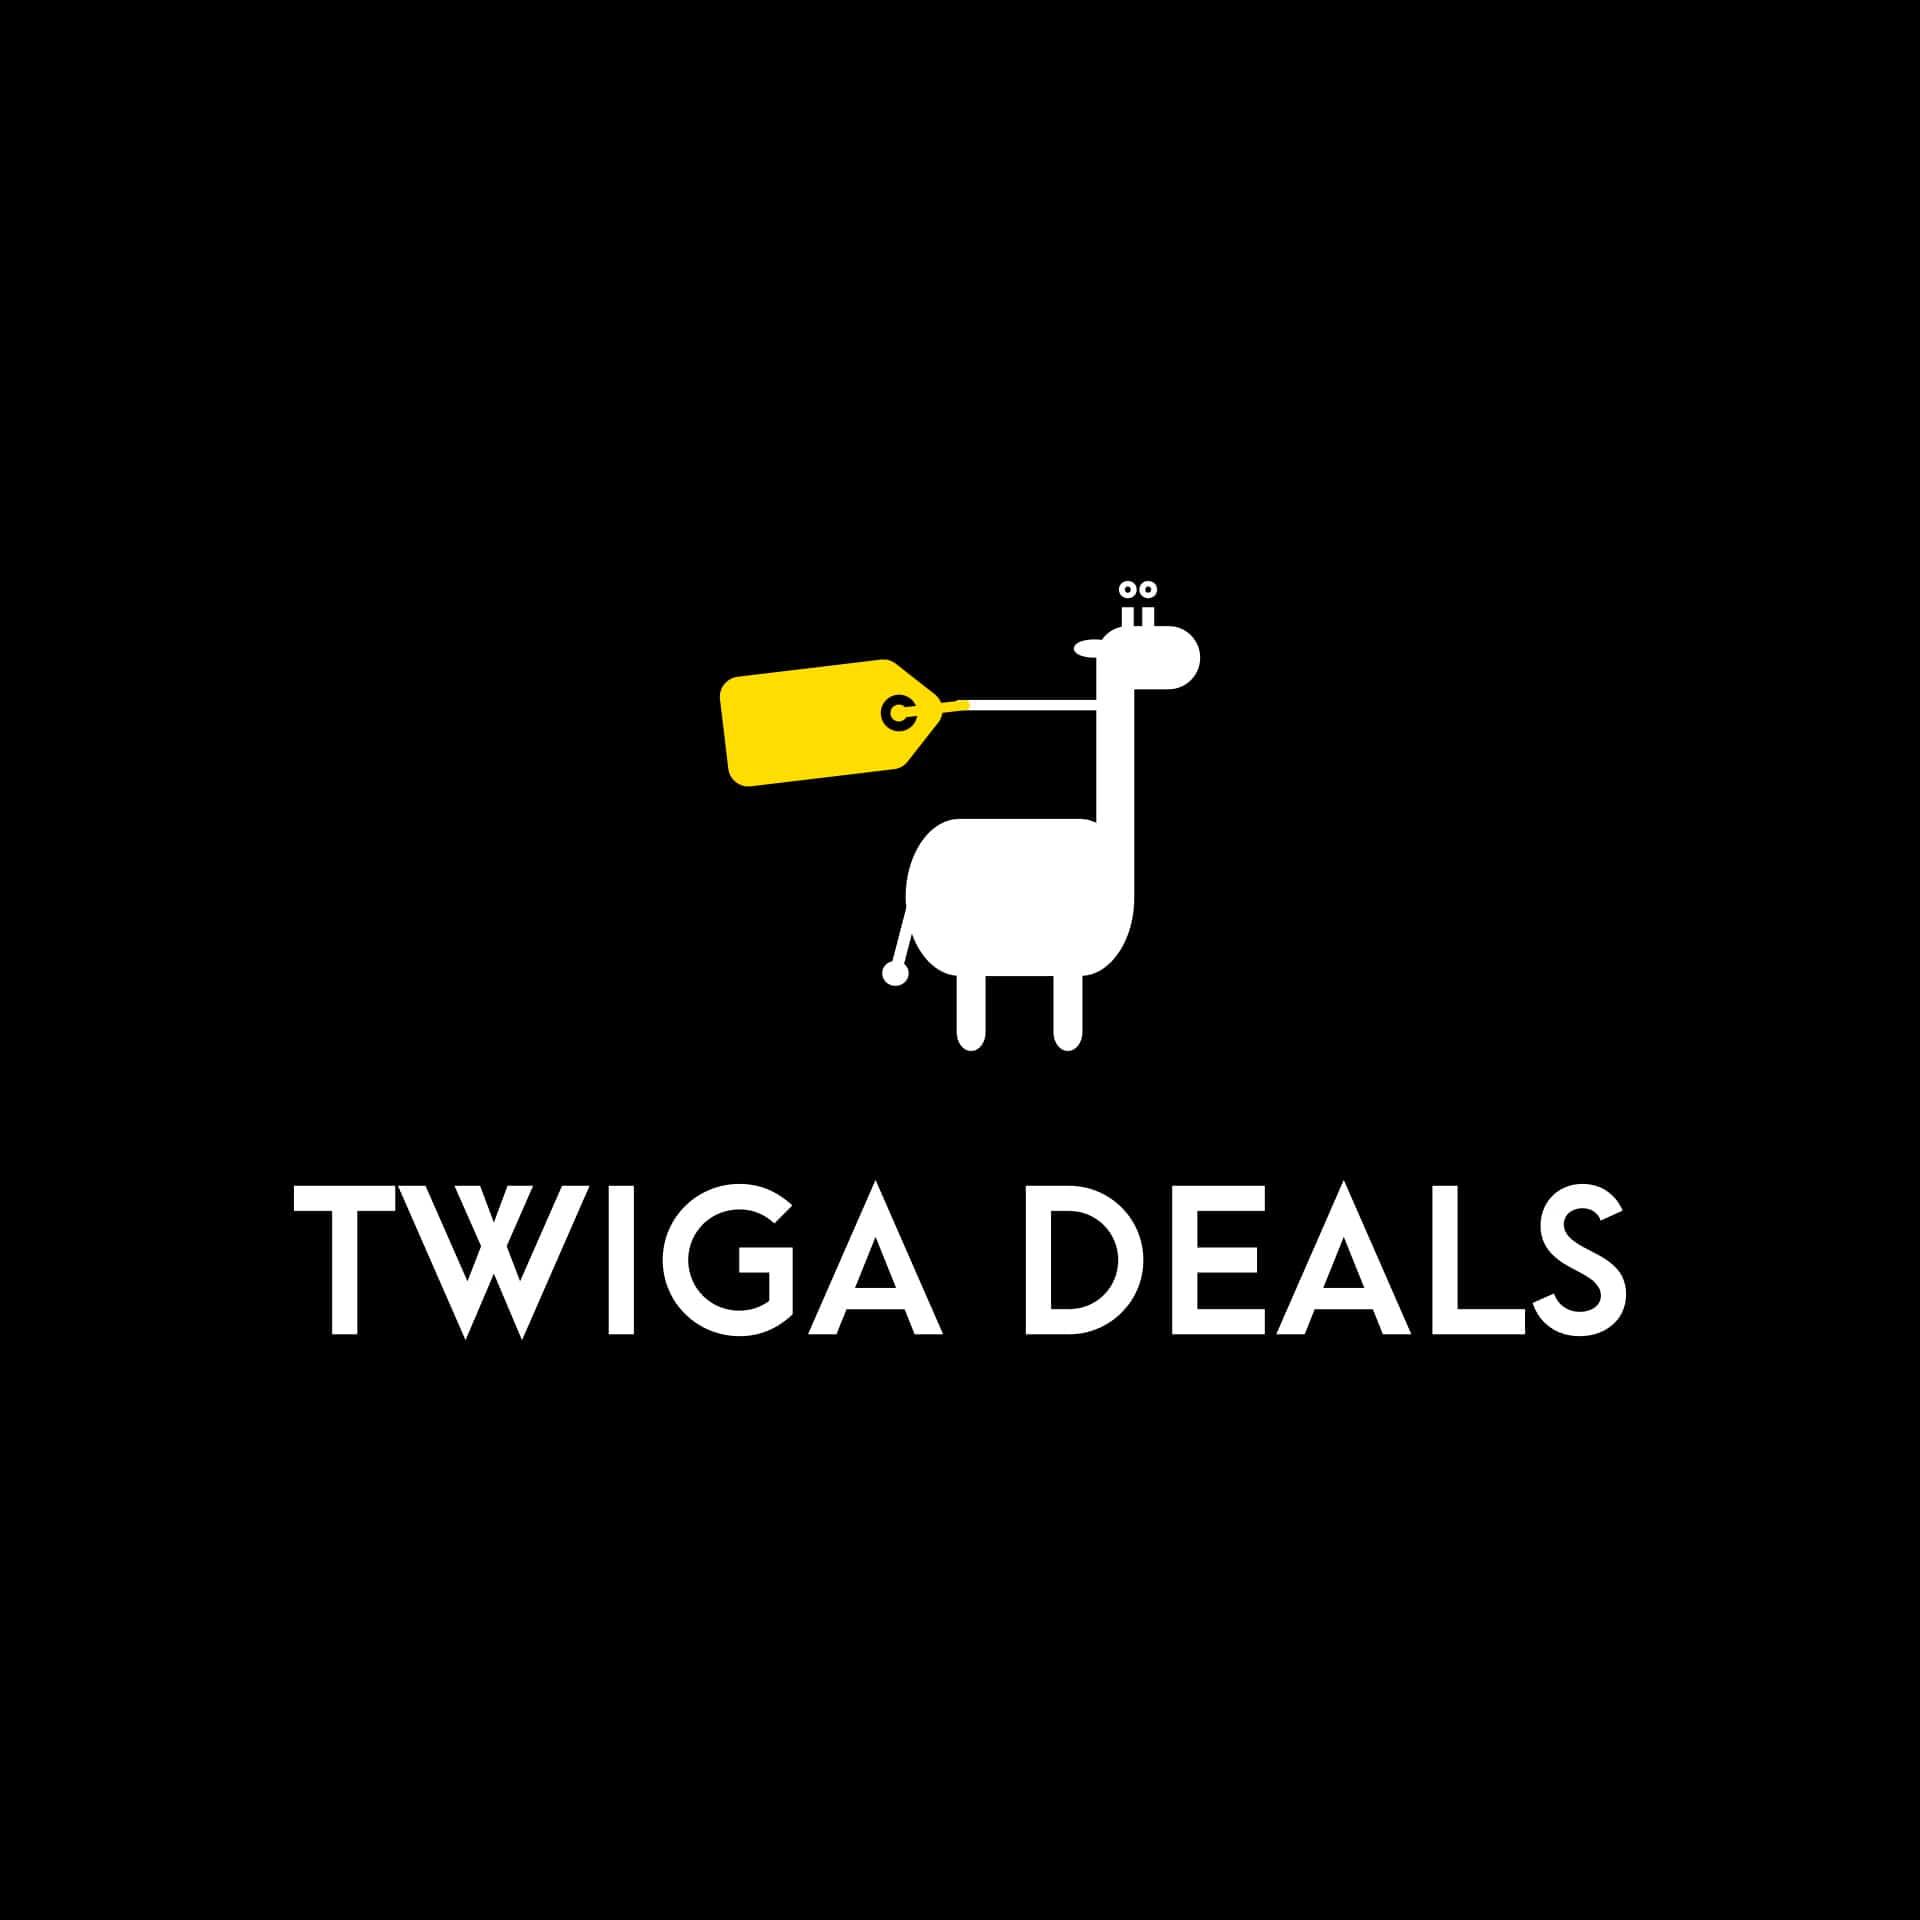 PROPAGANDA - twigadeals logob